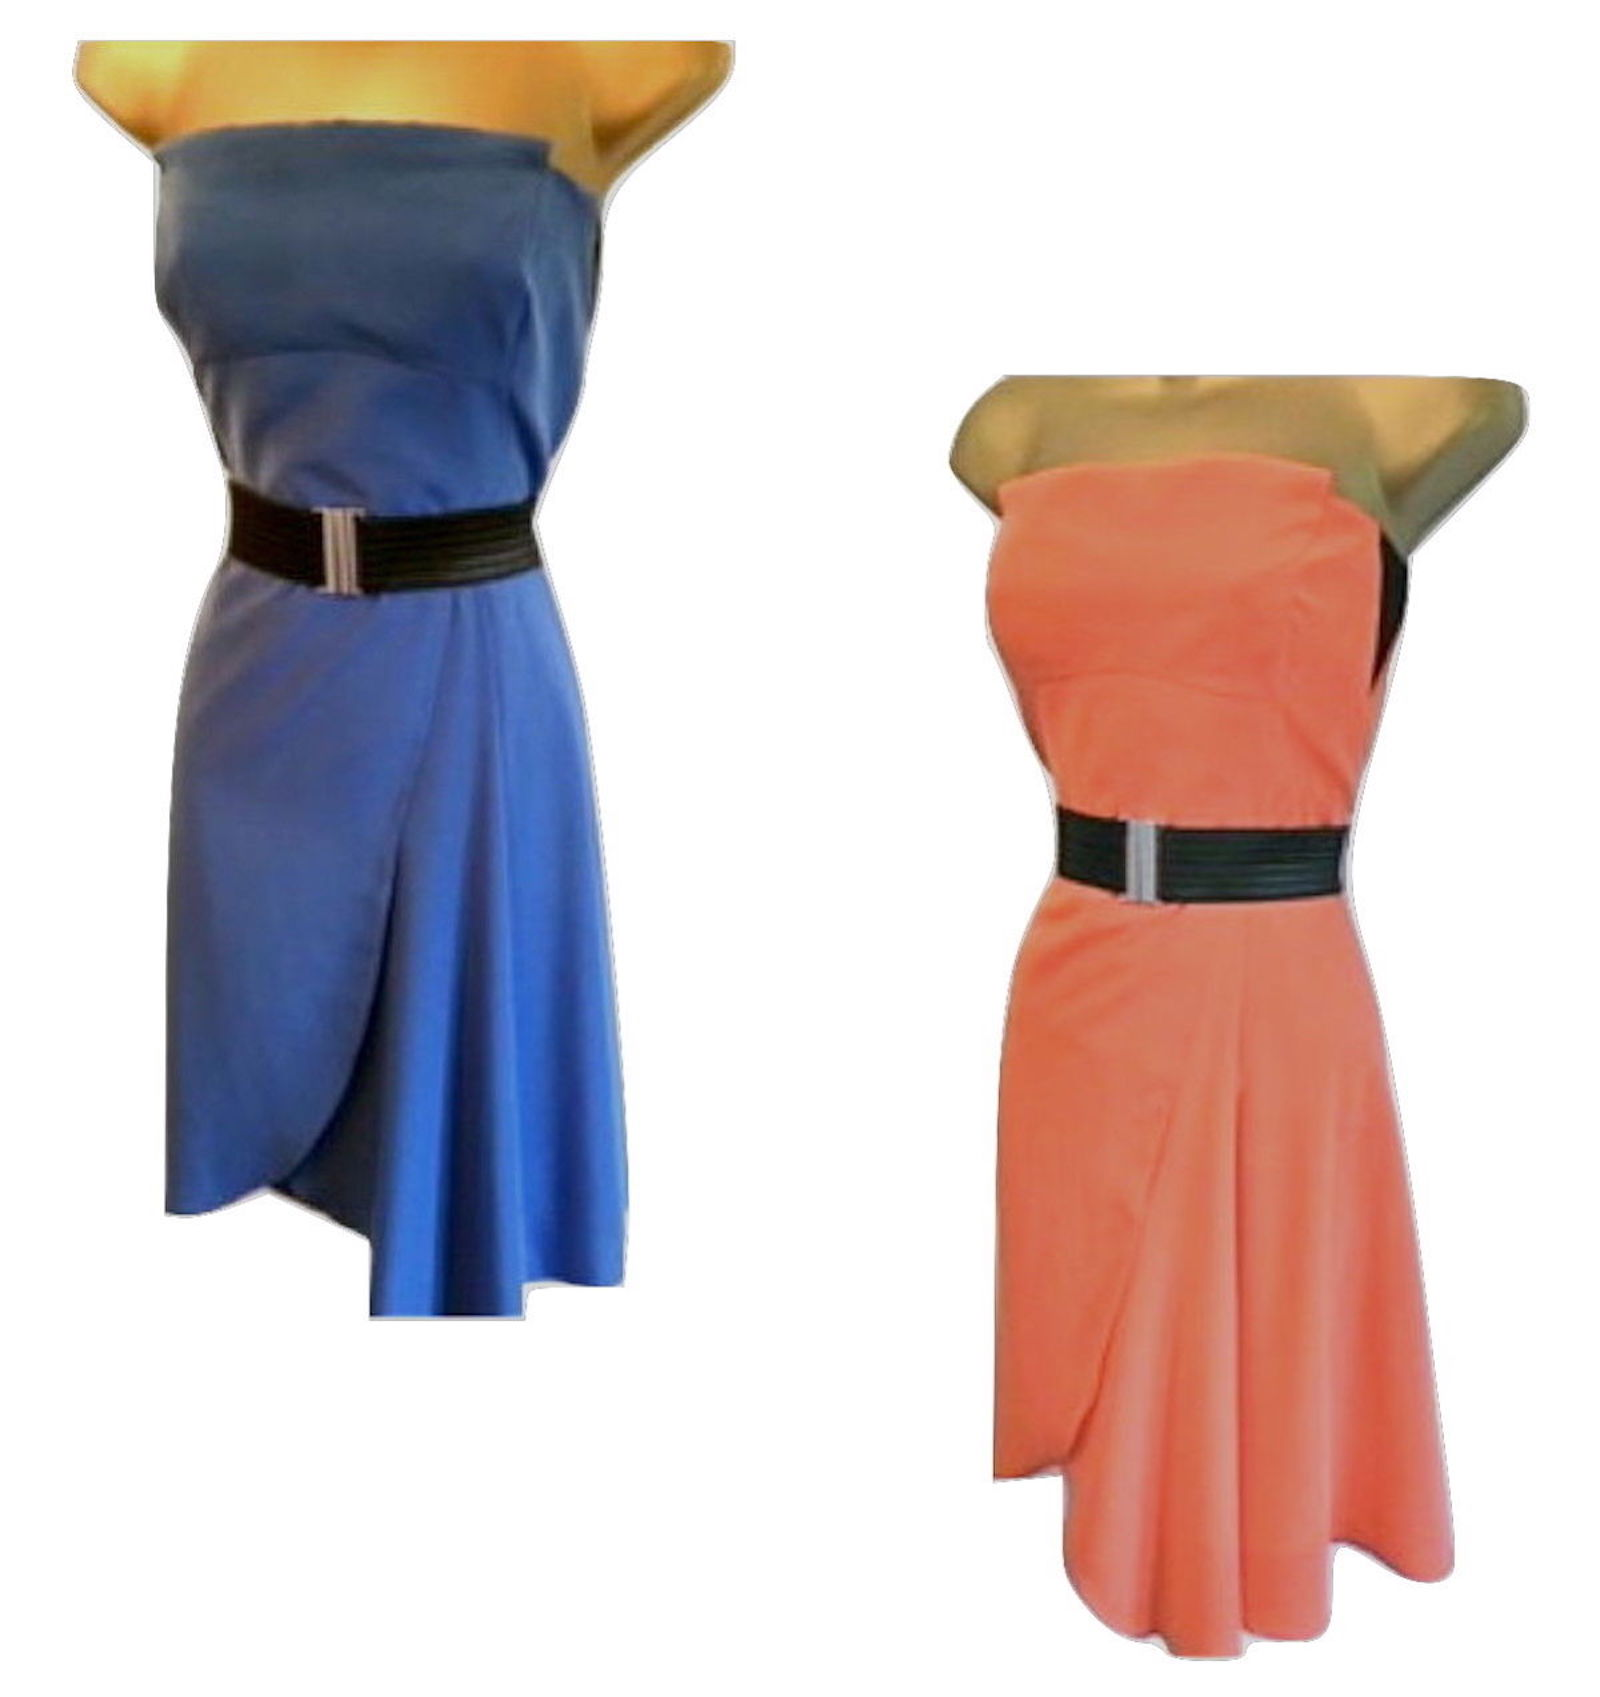 4c884d20d3c1 Designer Brand - Karen Millen Dress Shape - Fitted strapless. Main Colour -  Blue or Coral Orange Material - Soft Cupro Length - Knee Length Dress